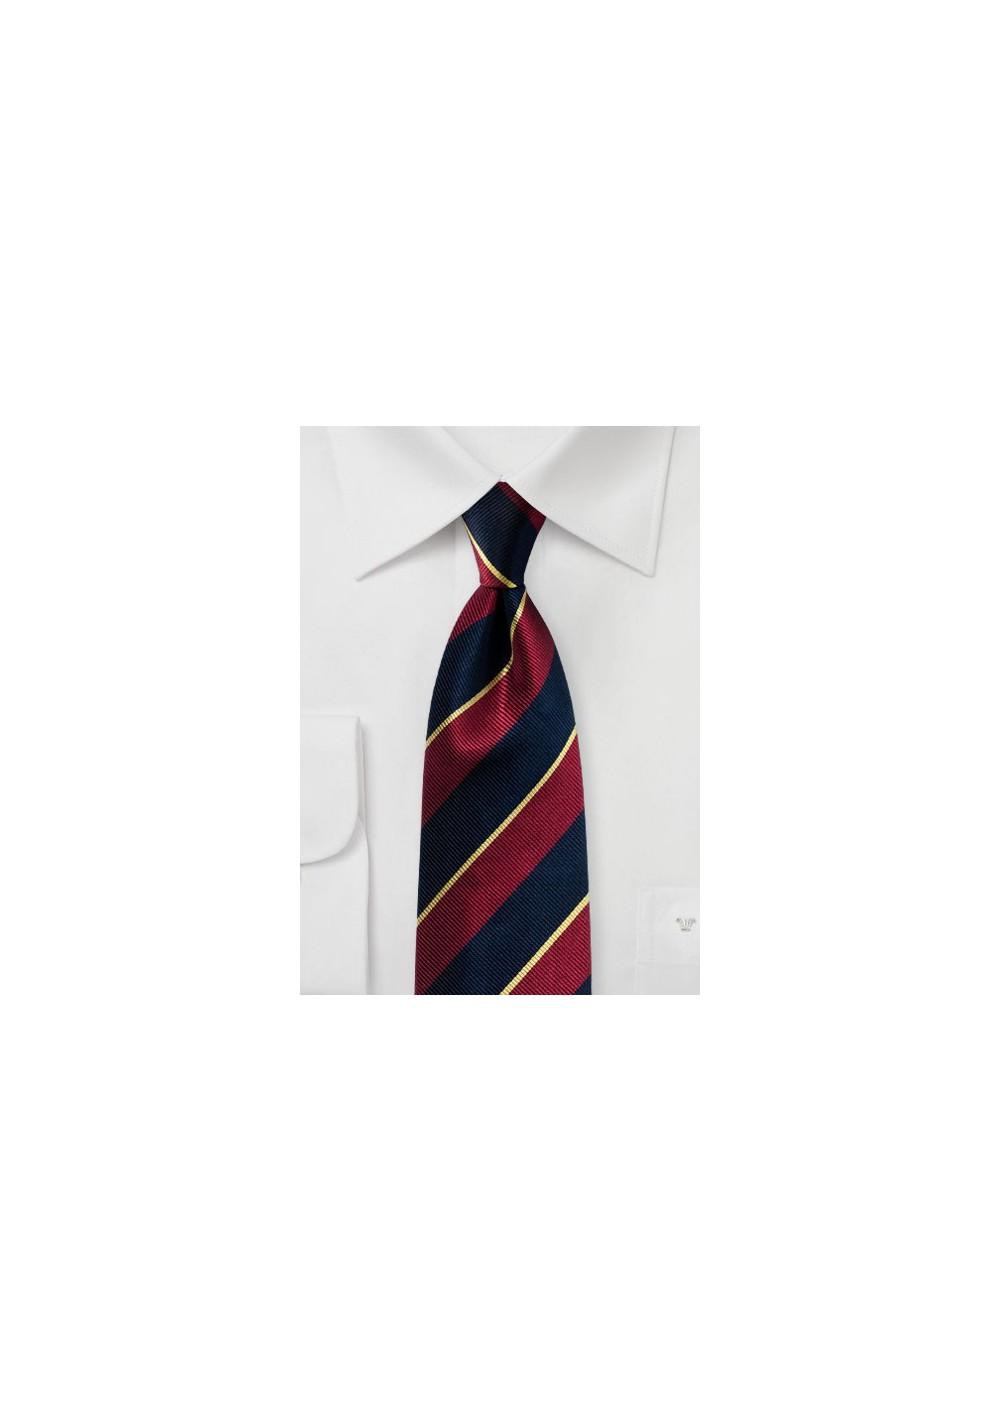 Classic Regimental Striped Tie in Navy, Burgundy, Gold